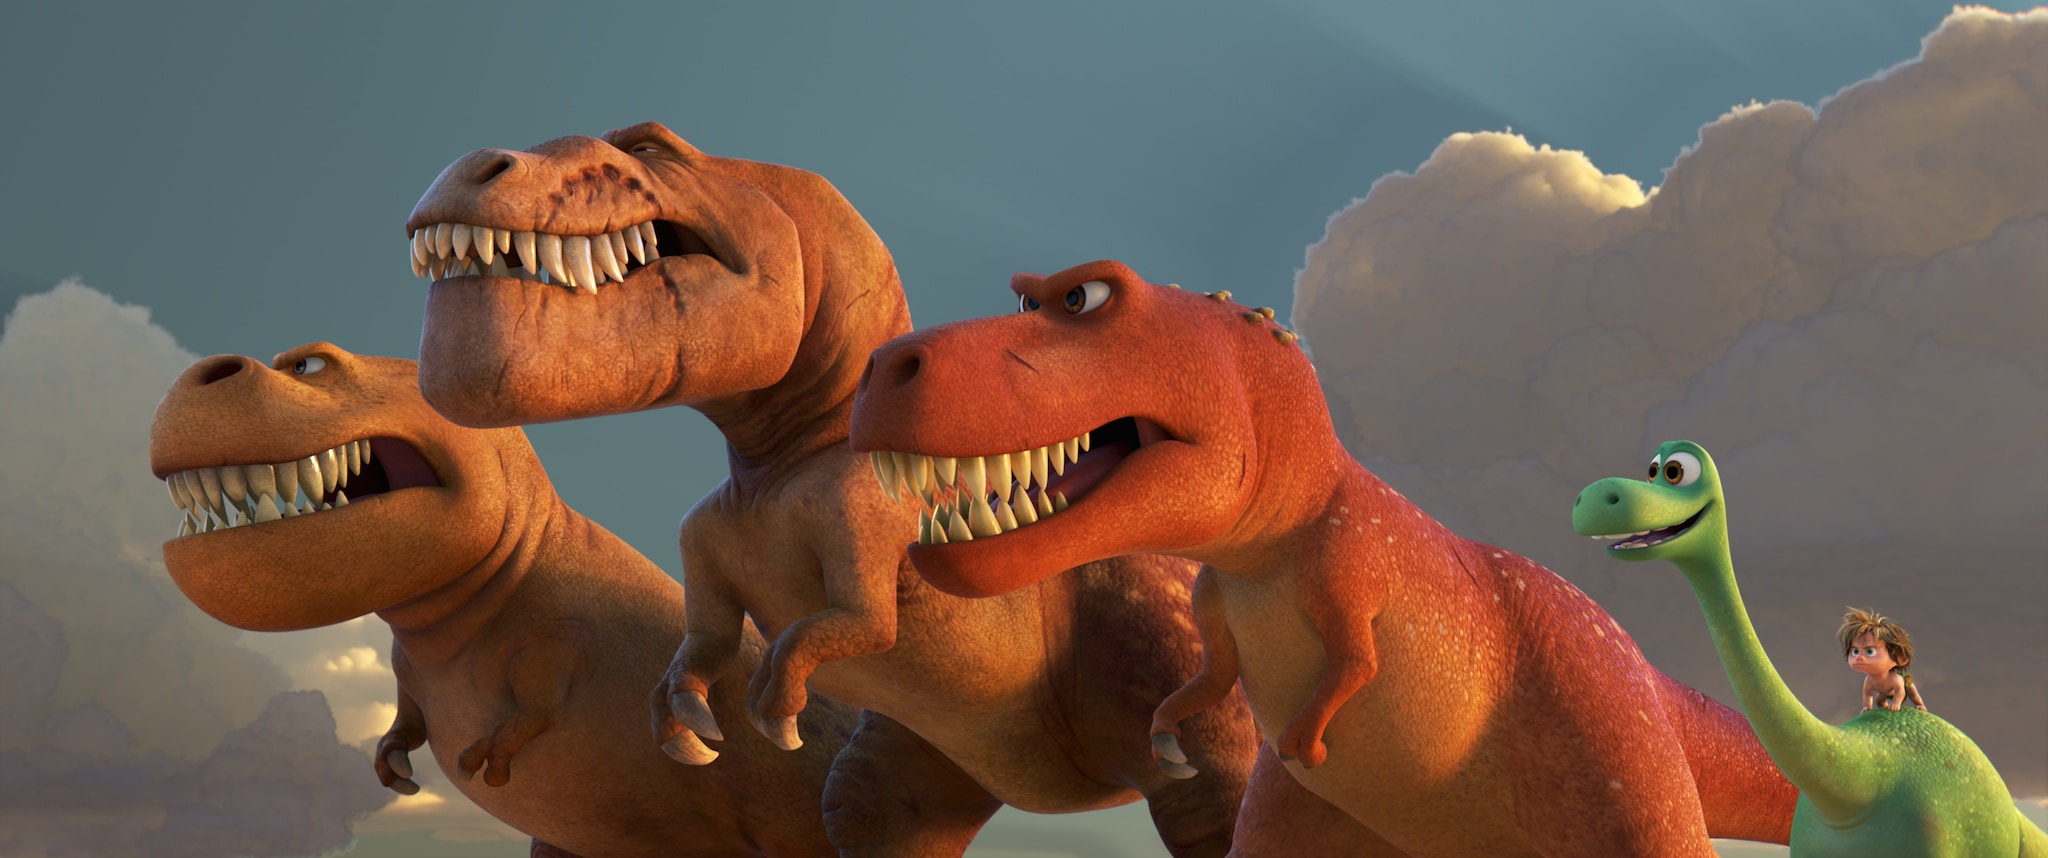 "Sam Elliott (Butch), Anna Paquin (Ramsey), A.J. Buckley (Nash), Raymond Ochoa (Arlo), and Jack Bright(Spot) in ""The Good Dinosaur"""